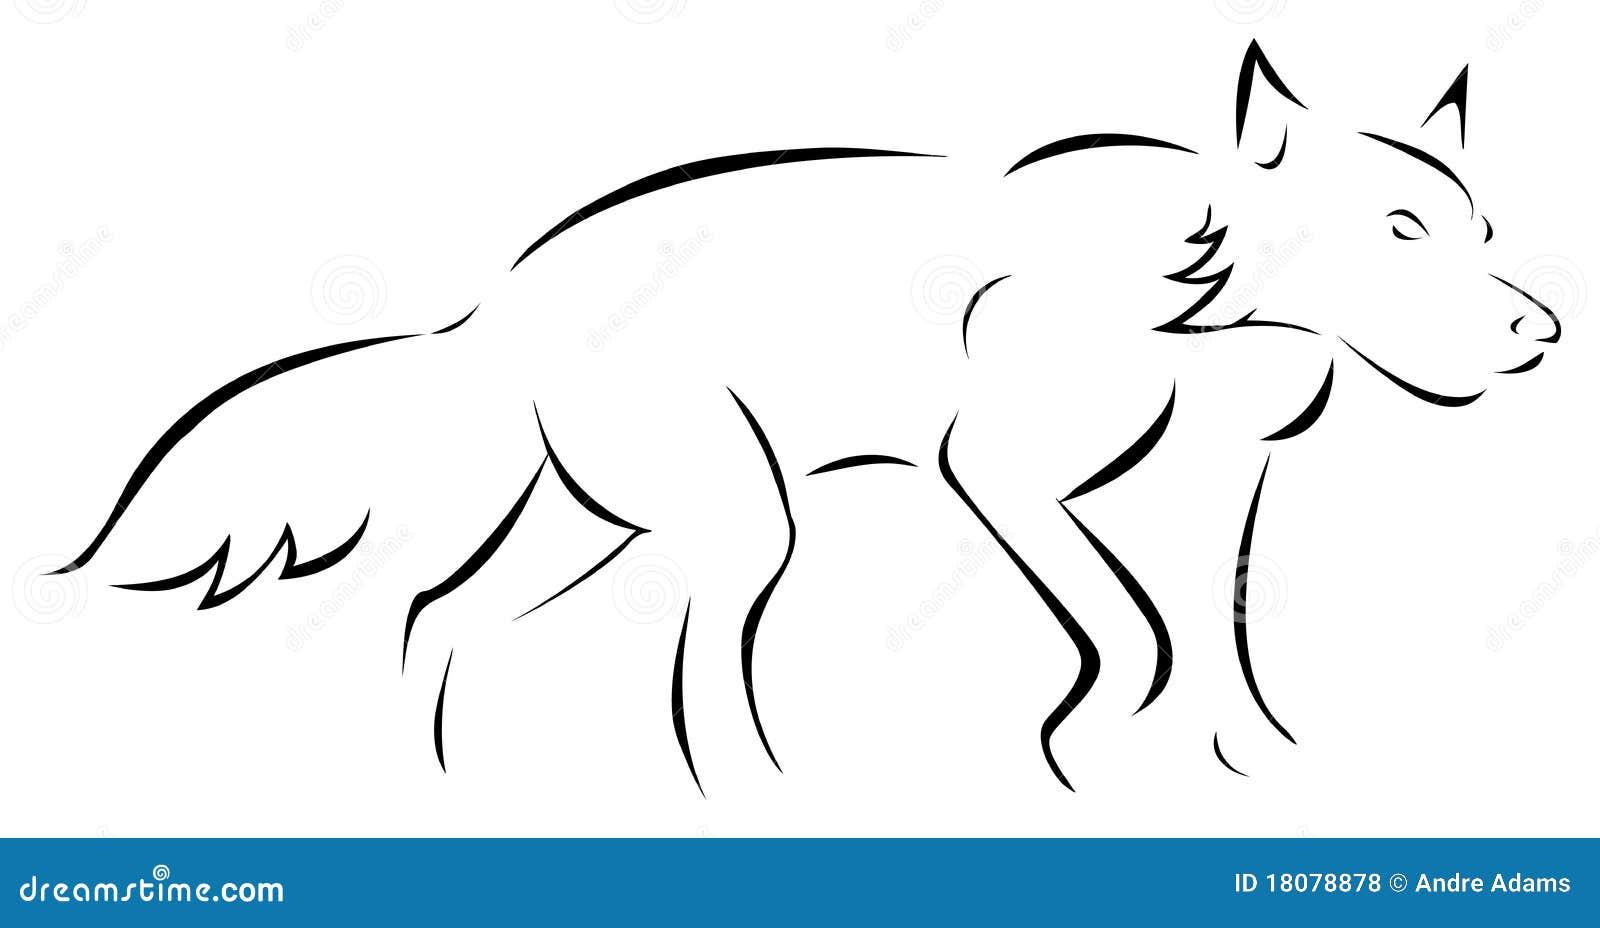 wolf outline stock vector illustration of stalking